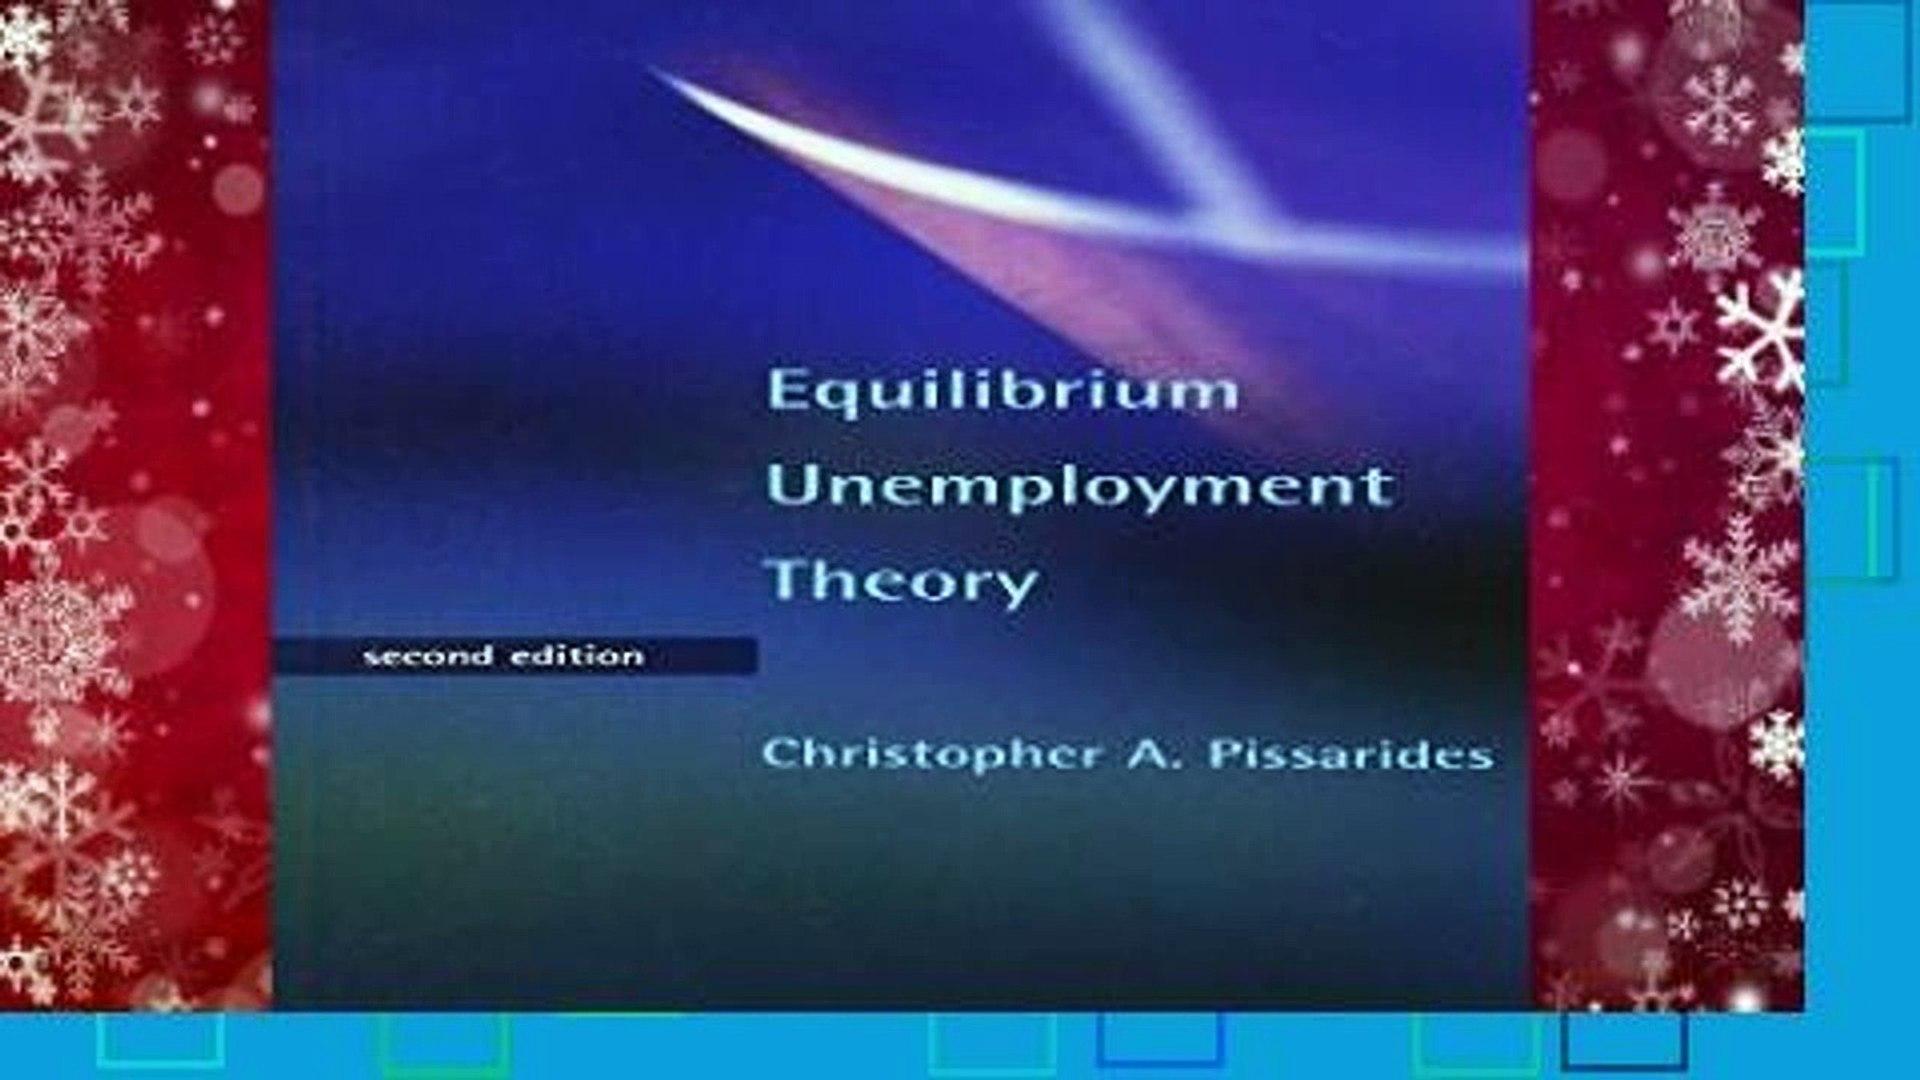 Equilibrium Unemployment Theory